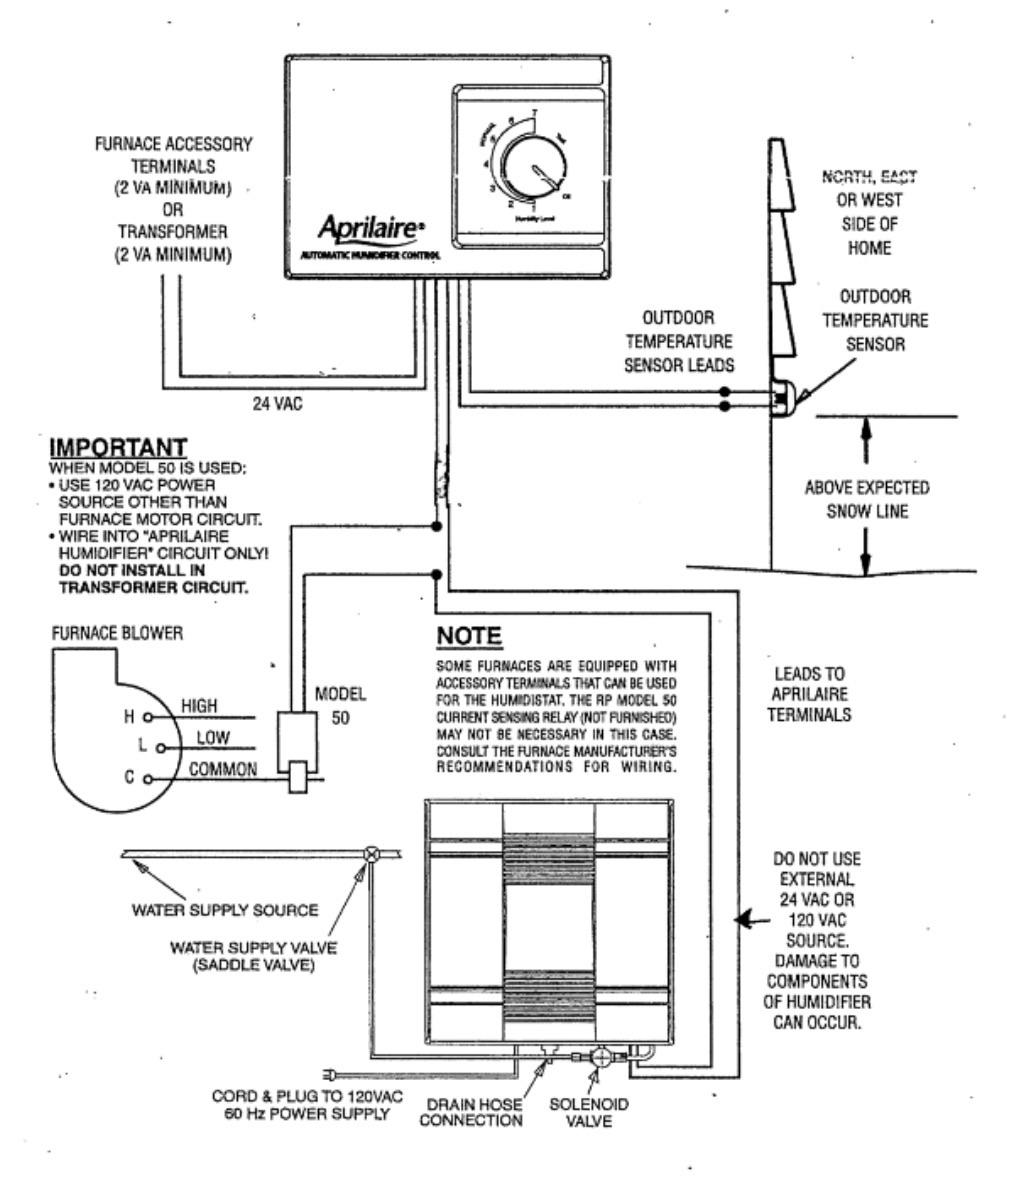 Aprilaire Current Sensing Relay Wiring Diagram | Wiring Diagram - Aprilaire 600 Wiring Diagram